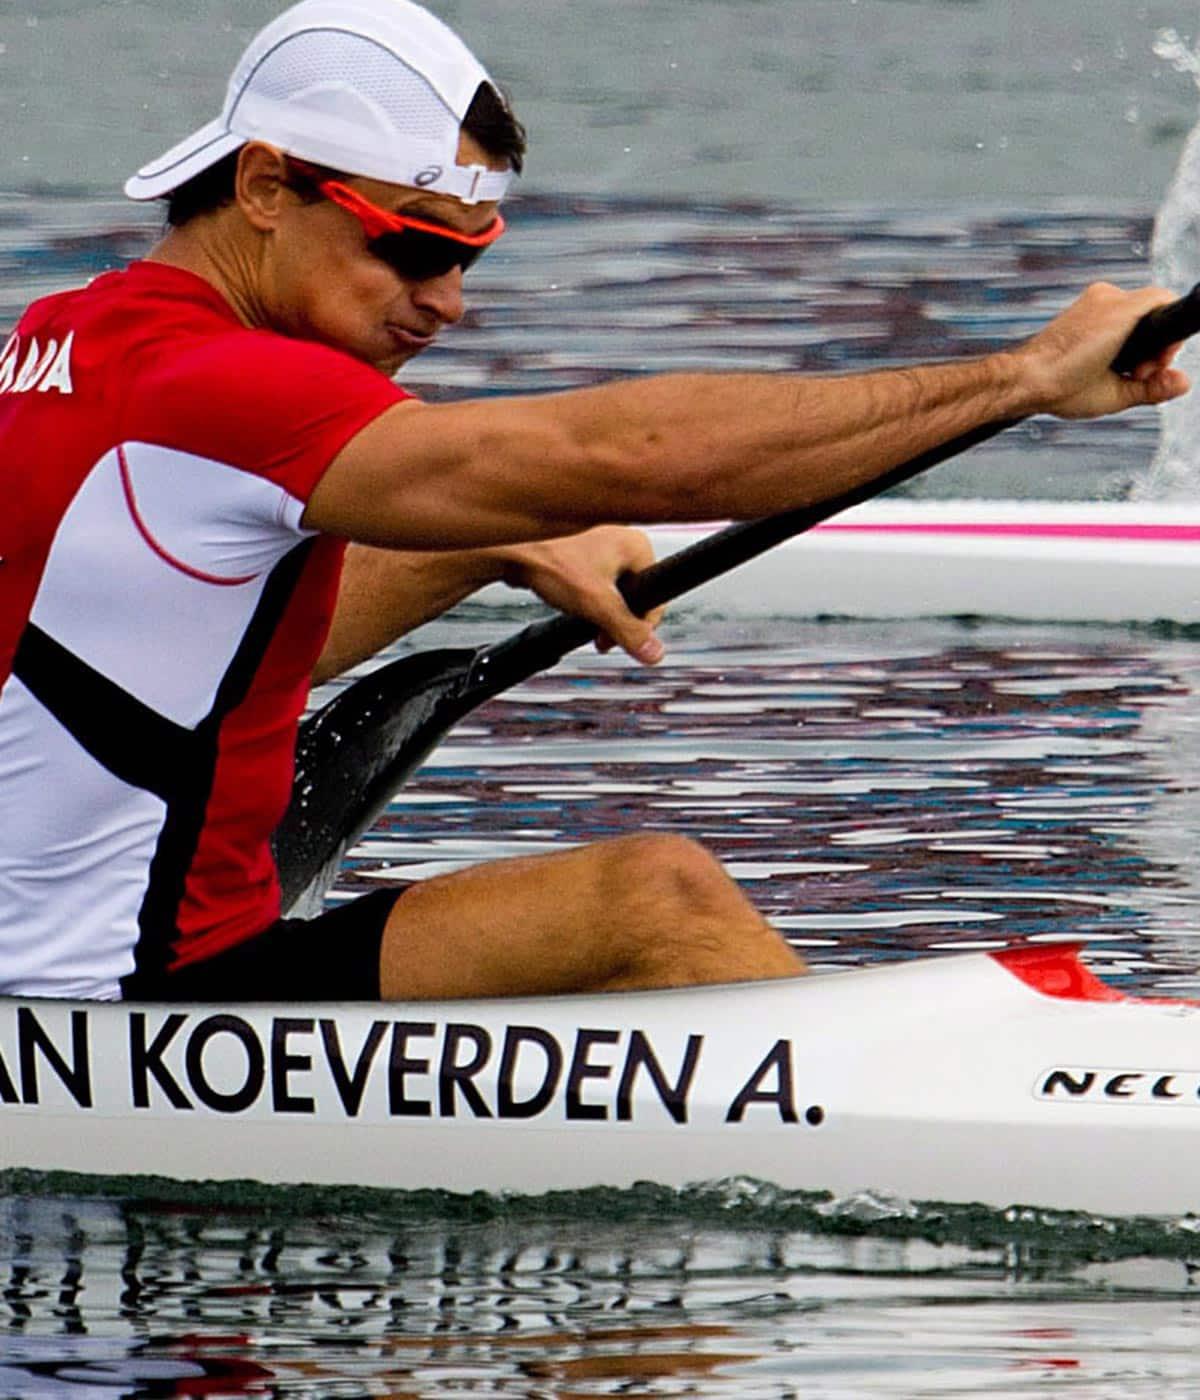 At his lowest, Adam van Koeverden uses conversation to cope